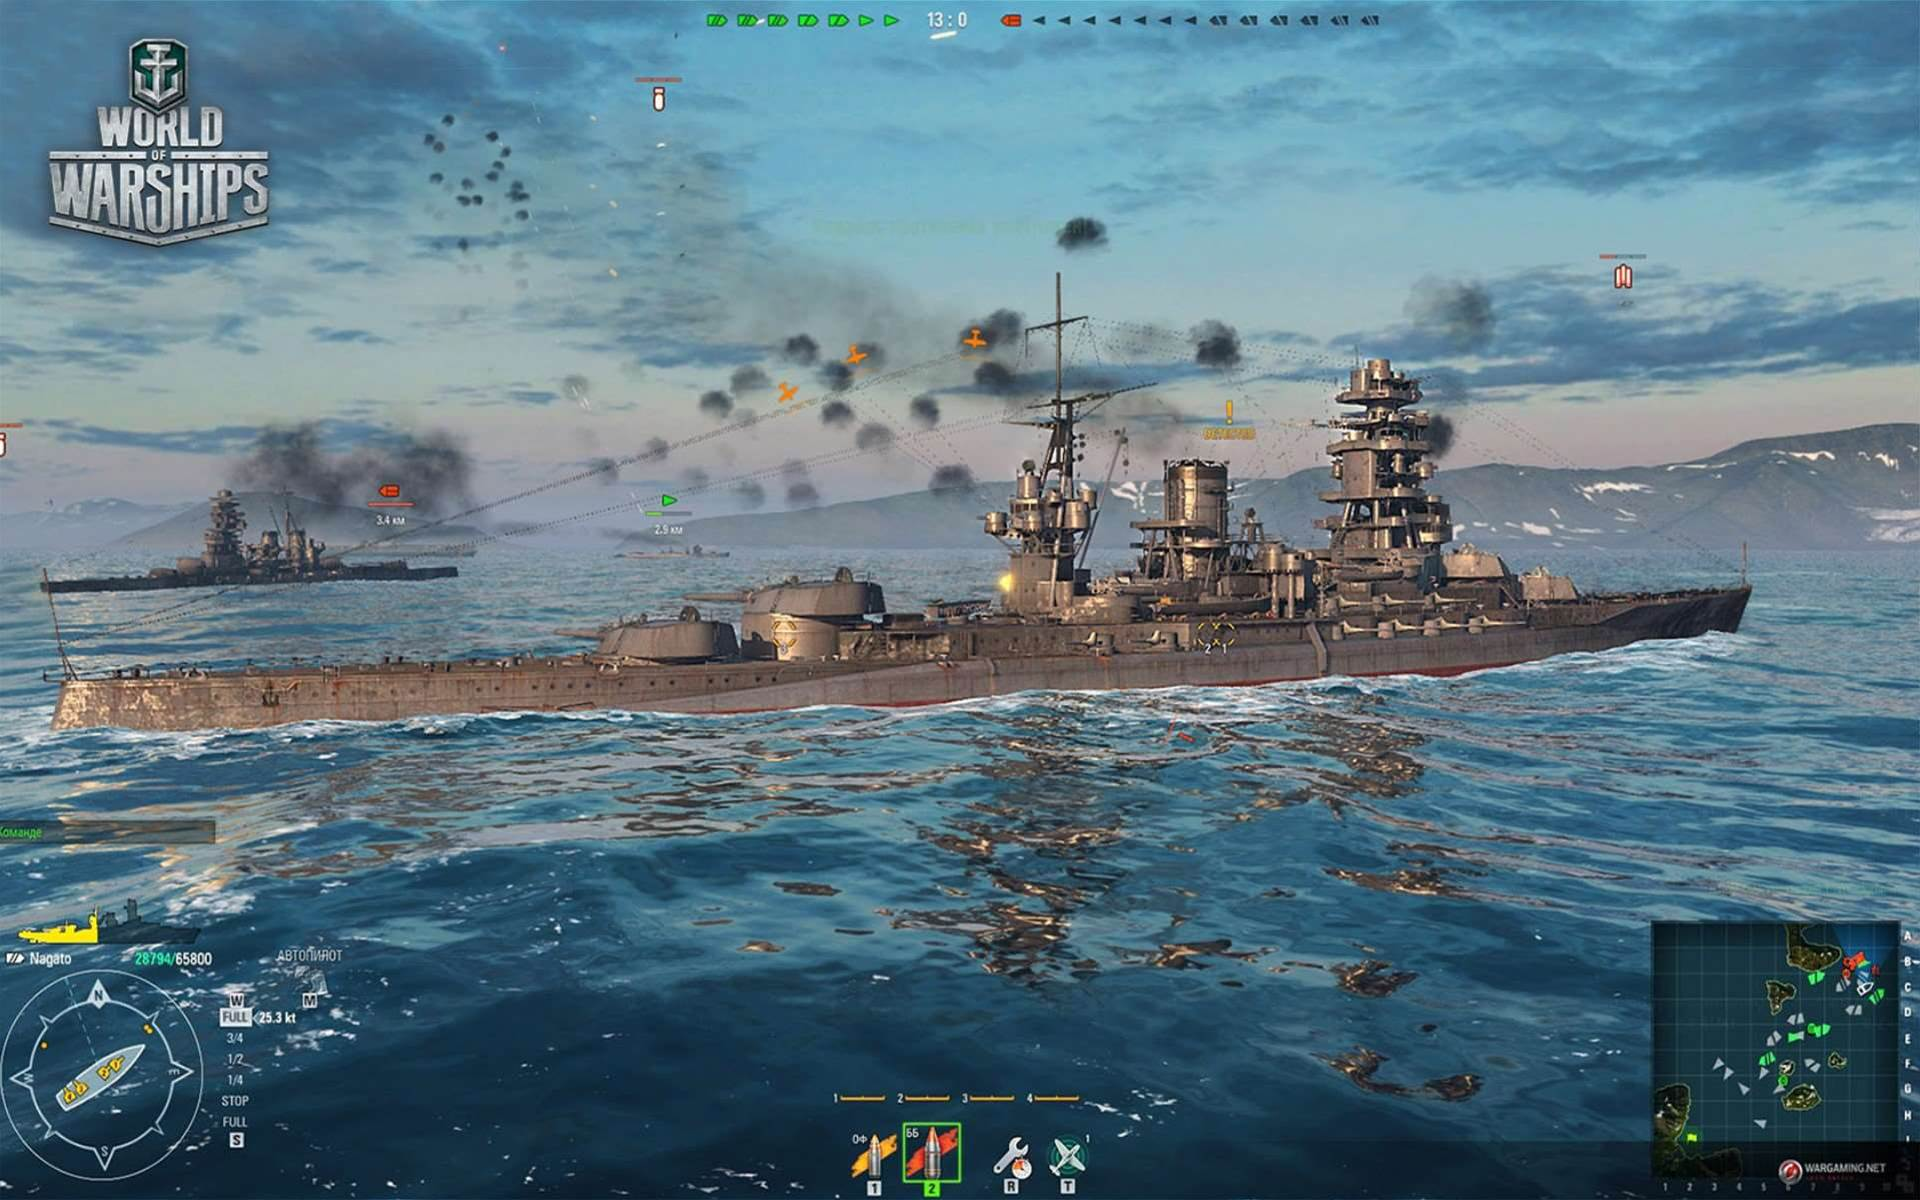 World of Warships hits open beta!